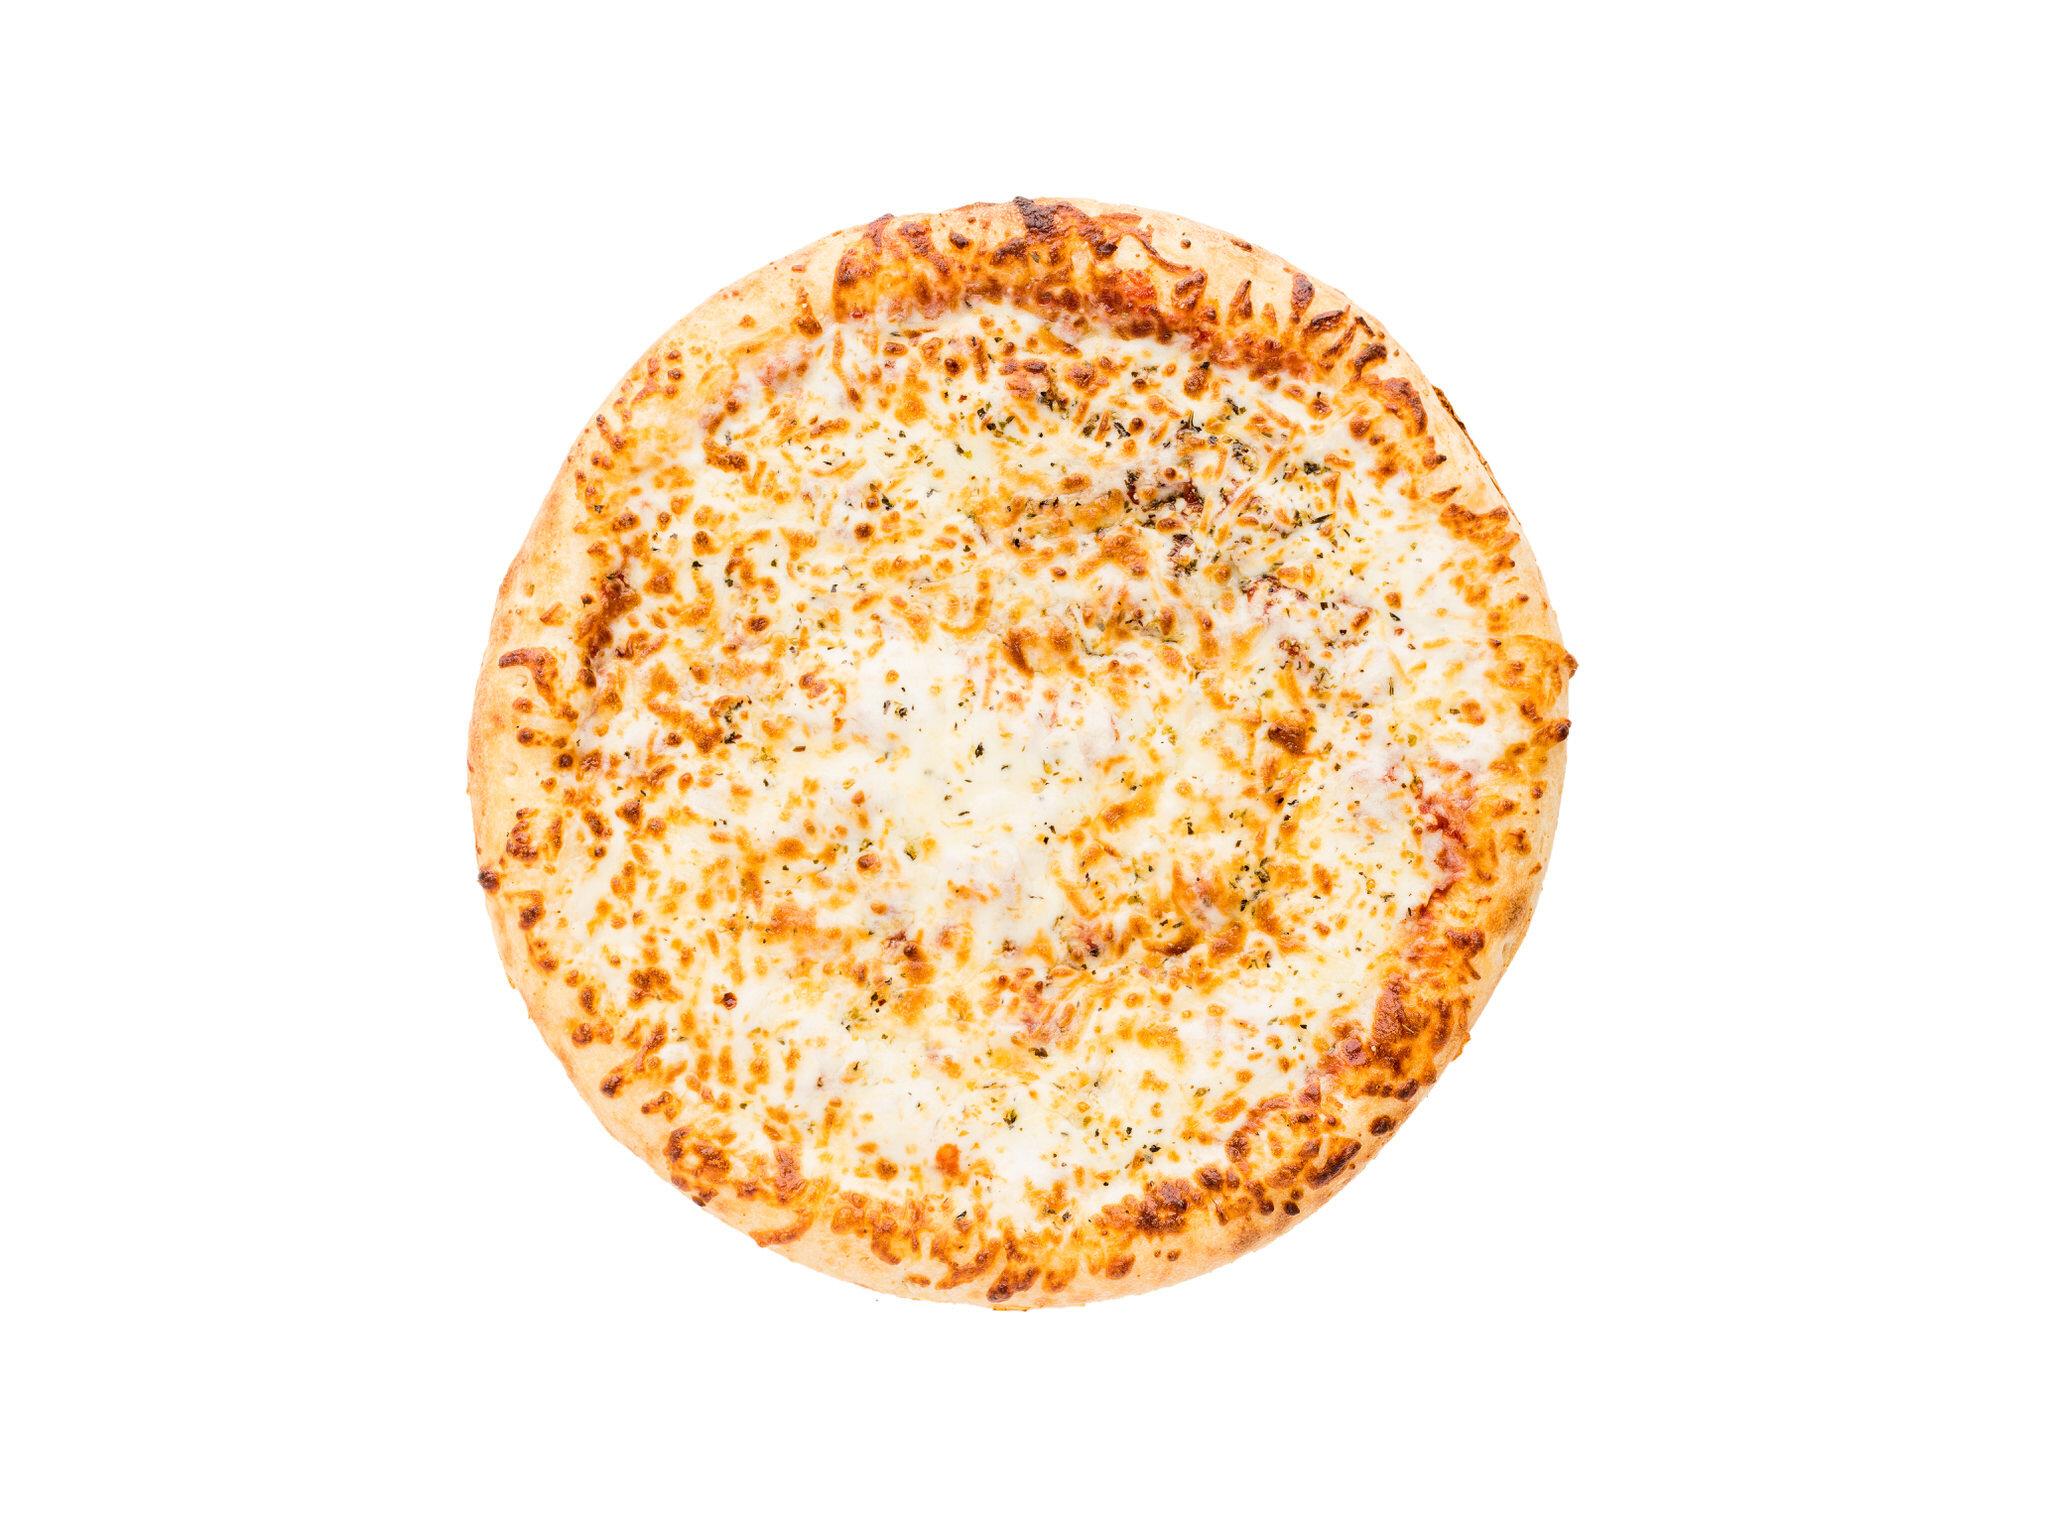 12 Inch Cheese Overhead.jpg